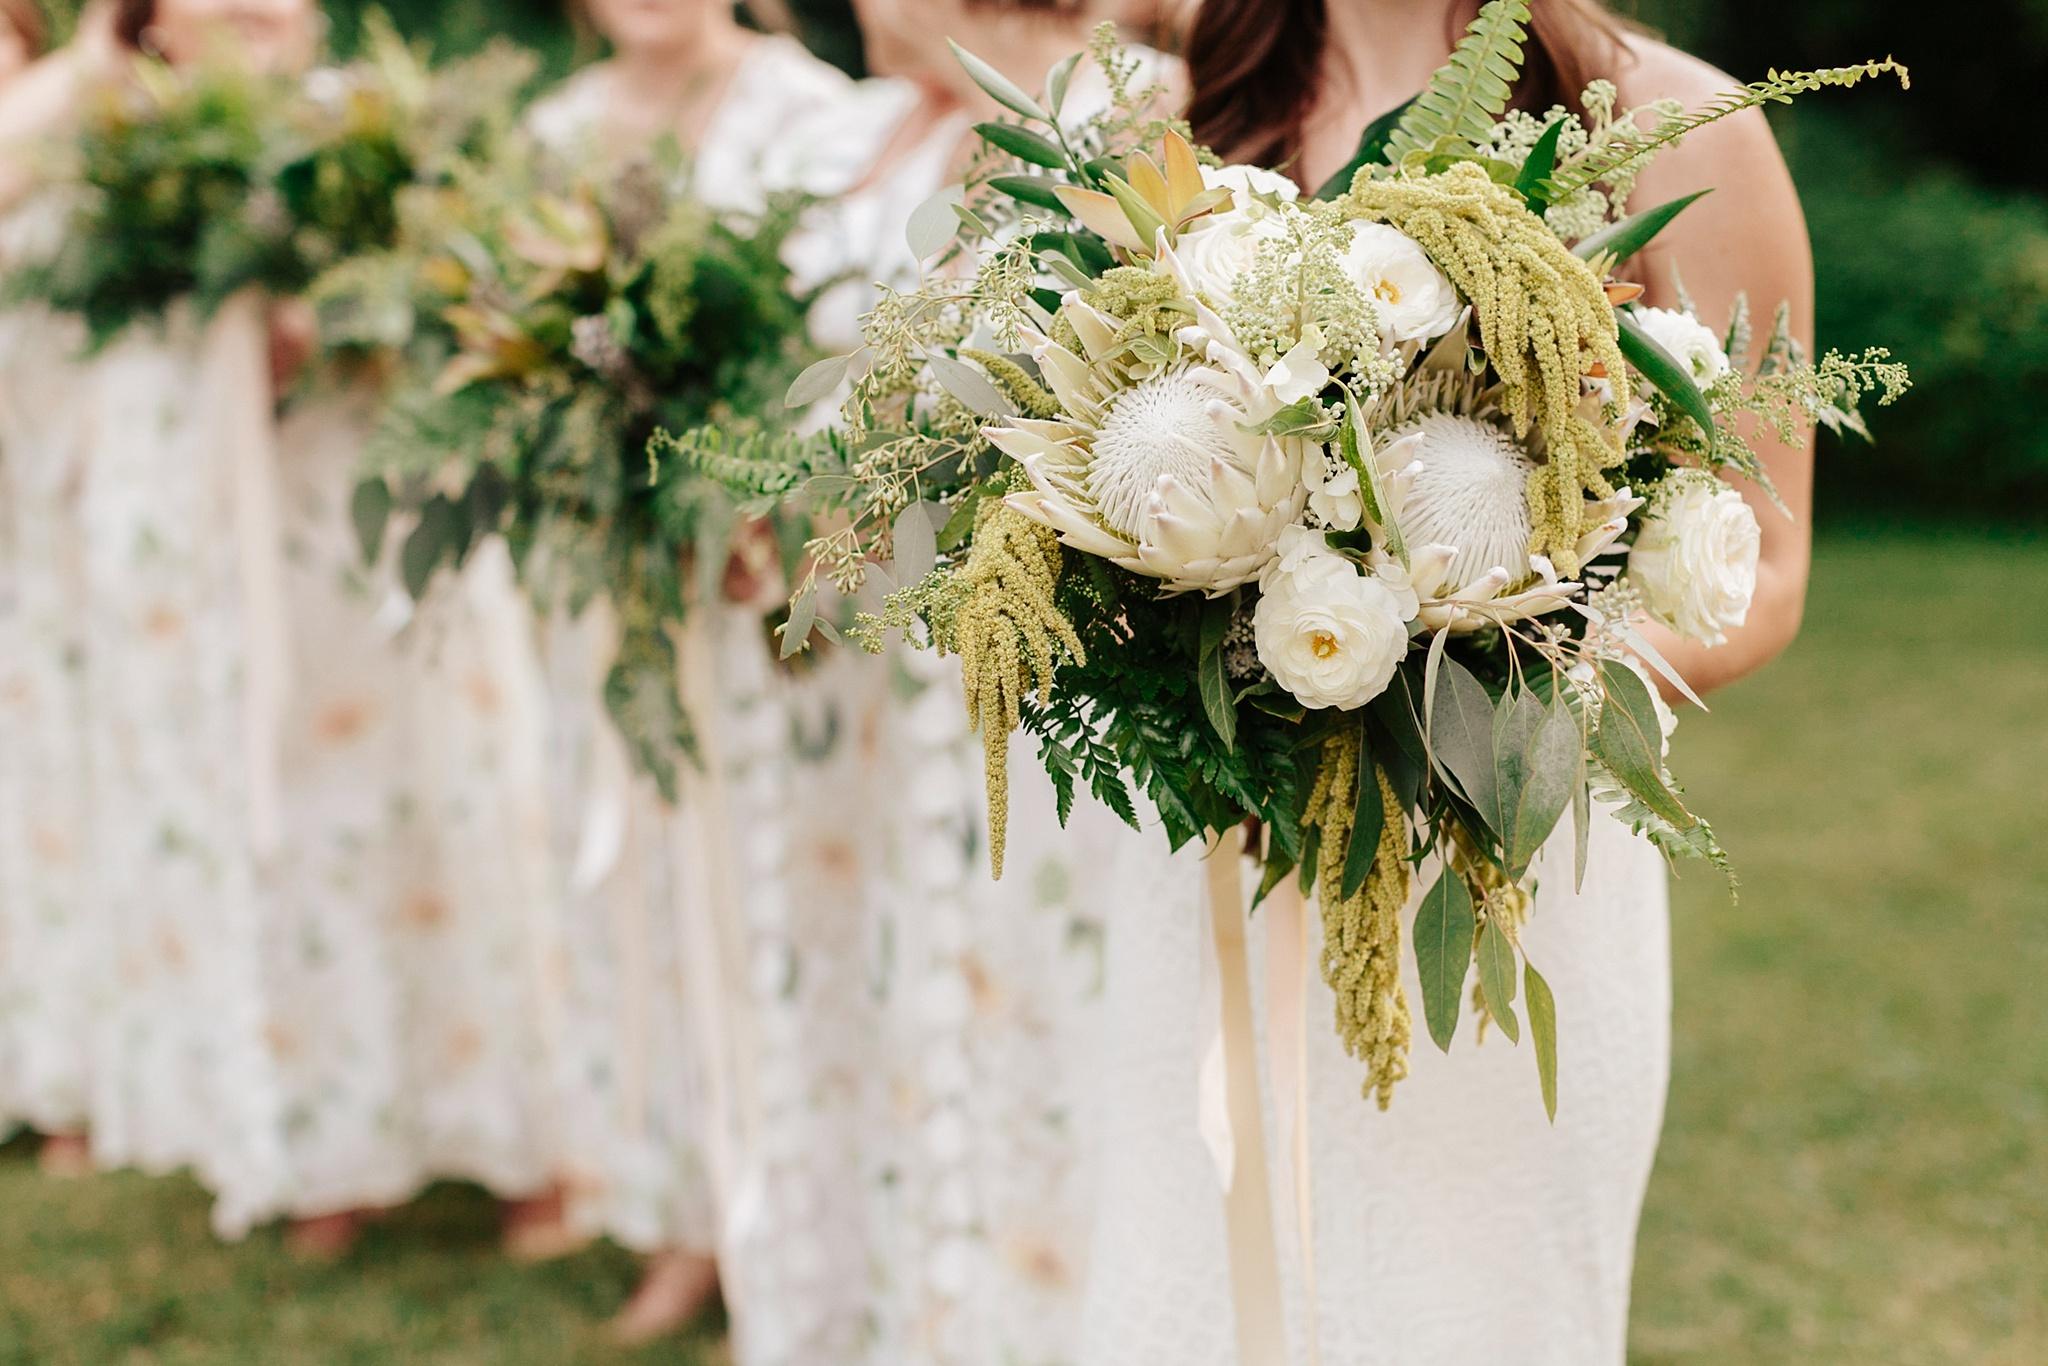 Wedding Party Bouquet